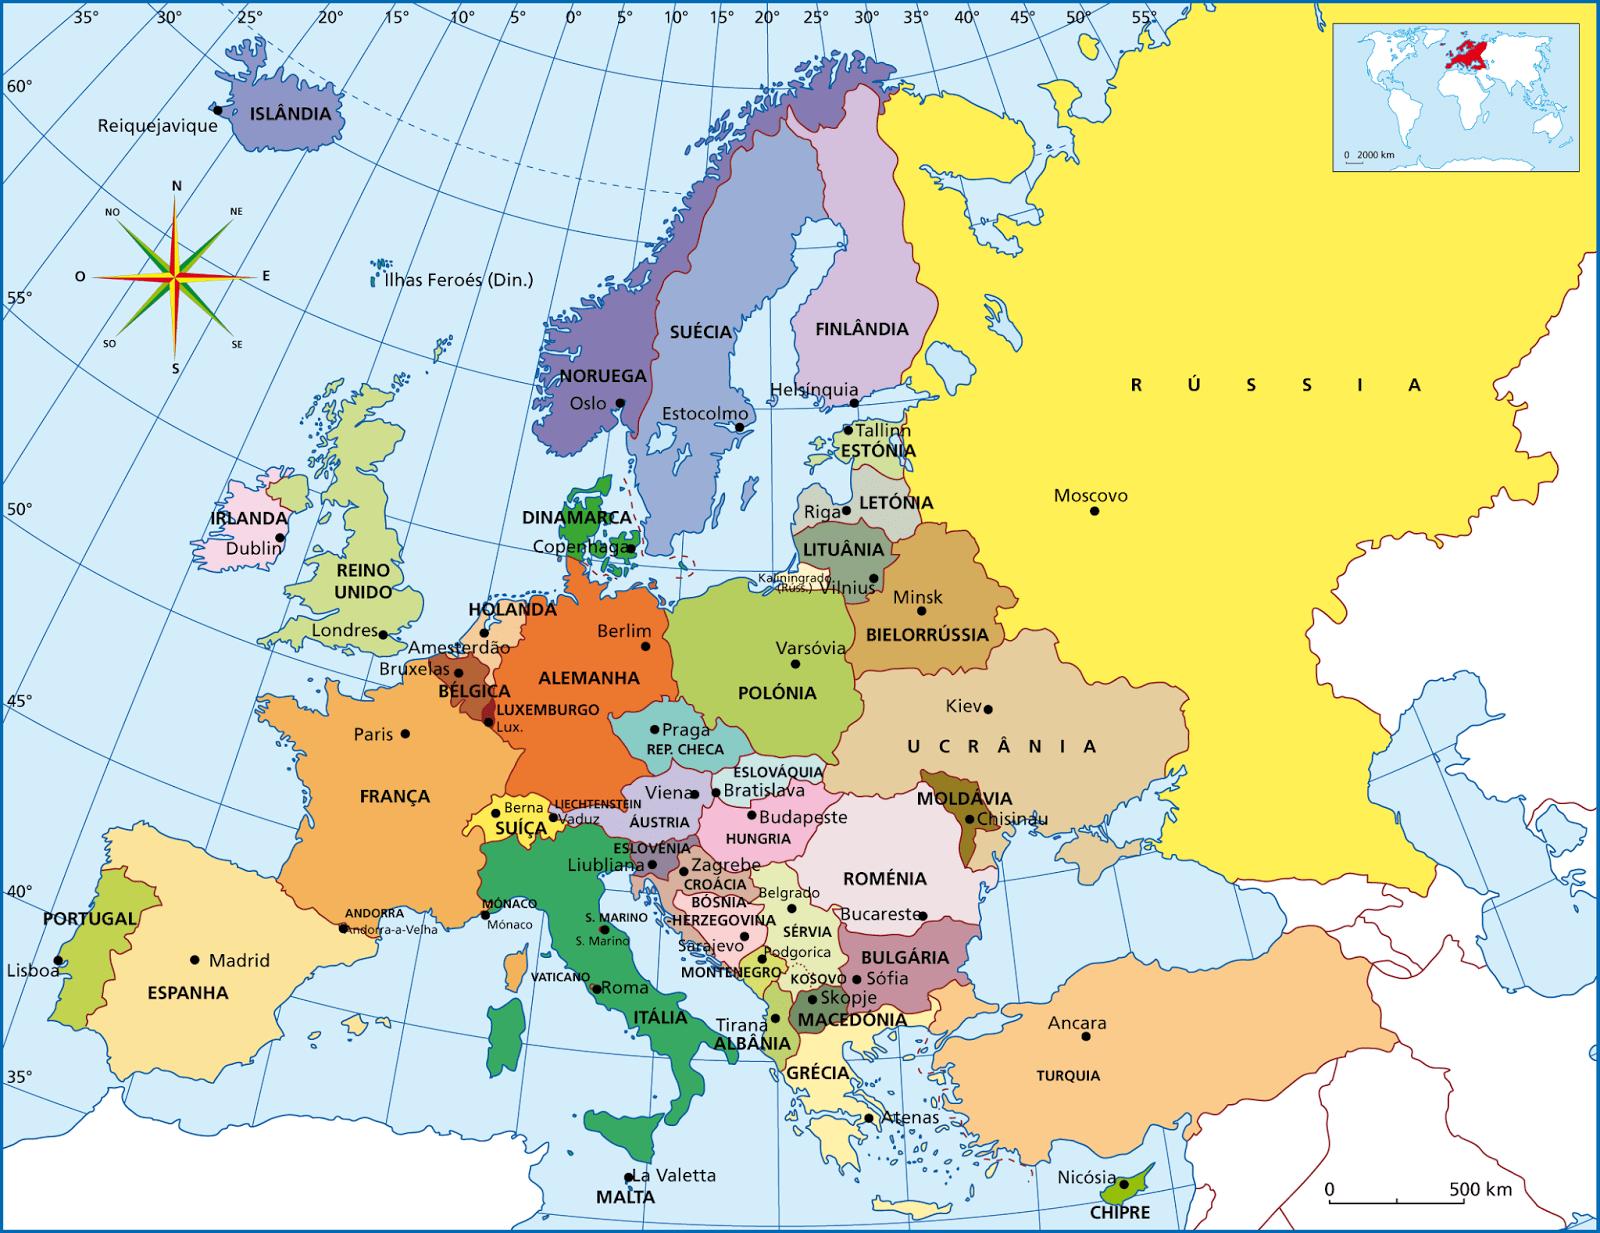 Paises y capitales de Europa  Ara blog